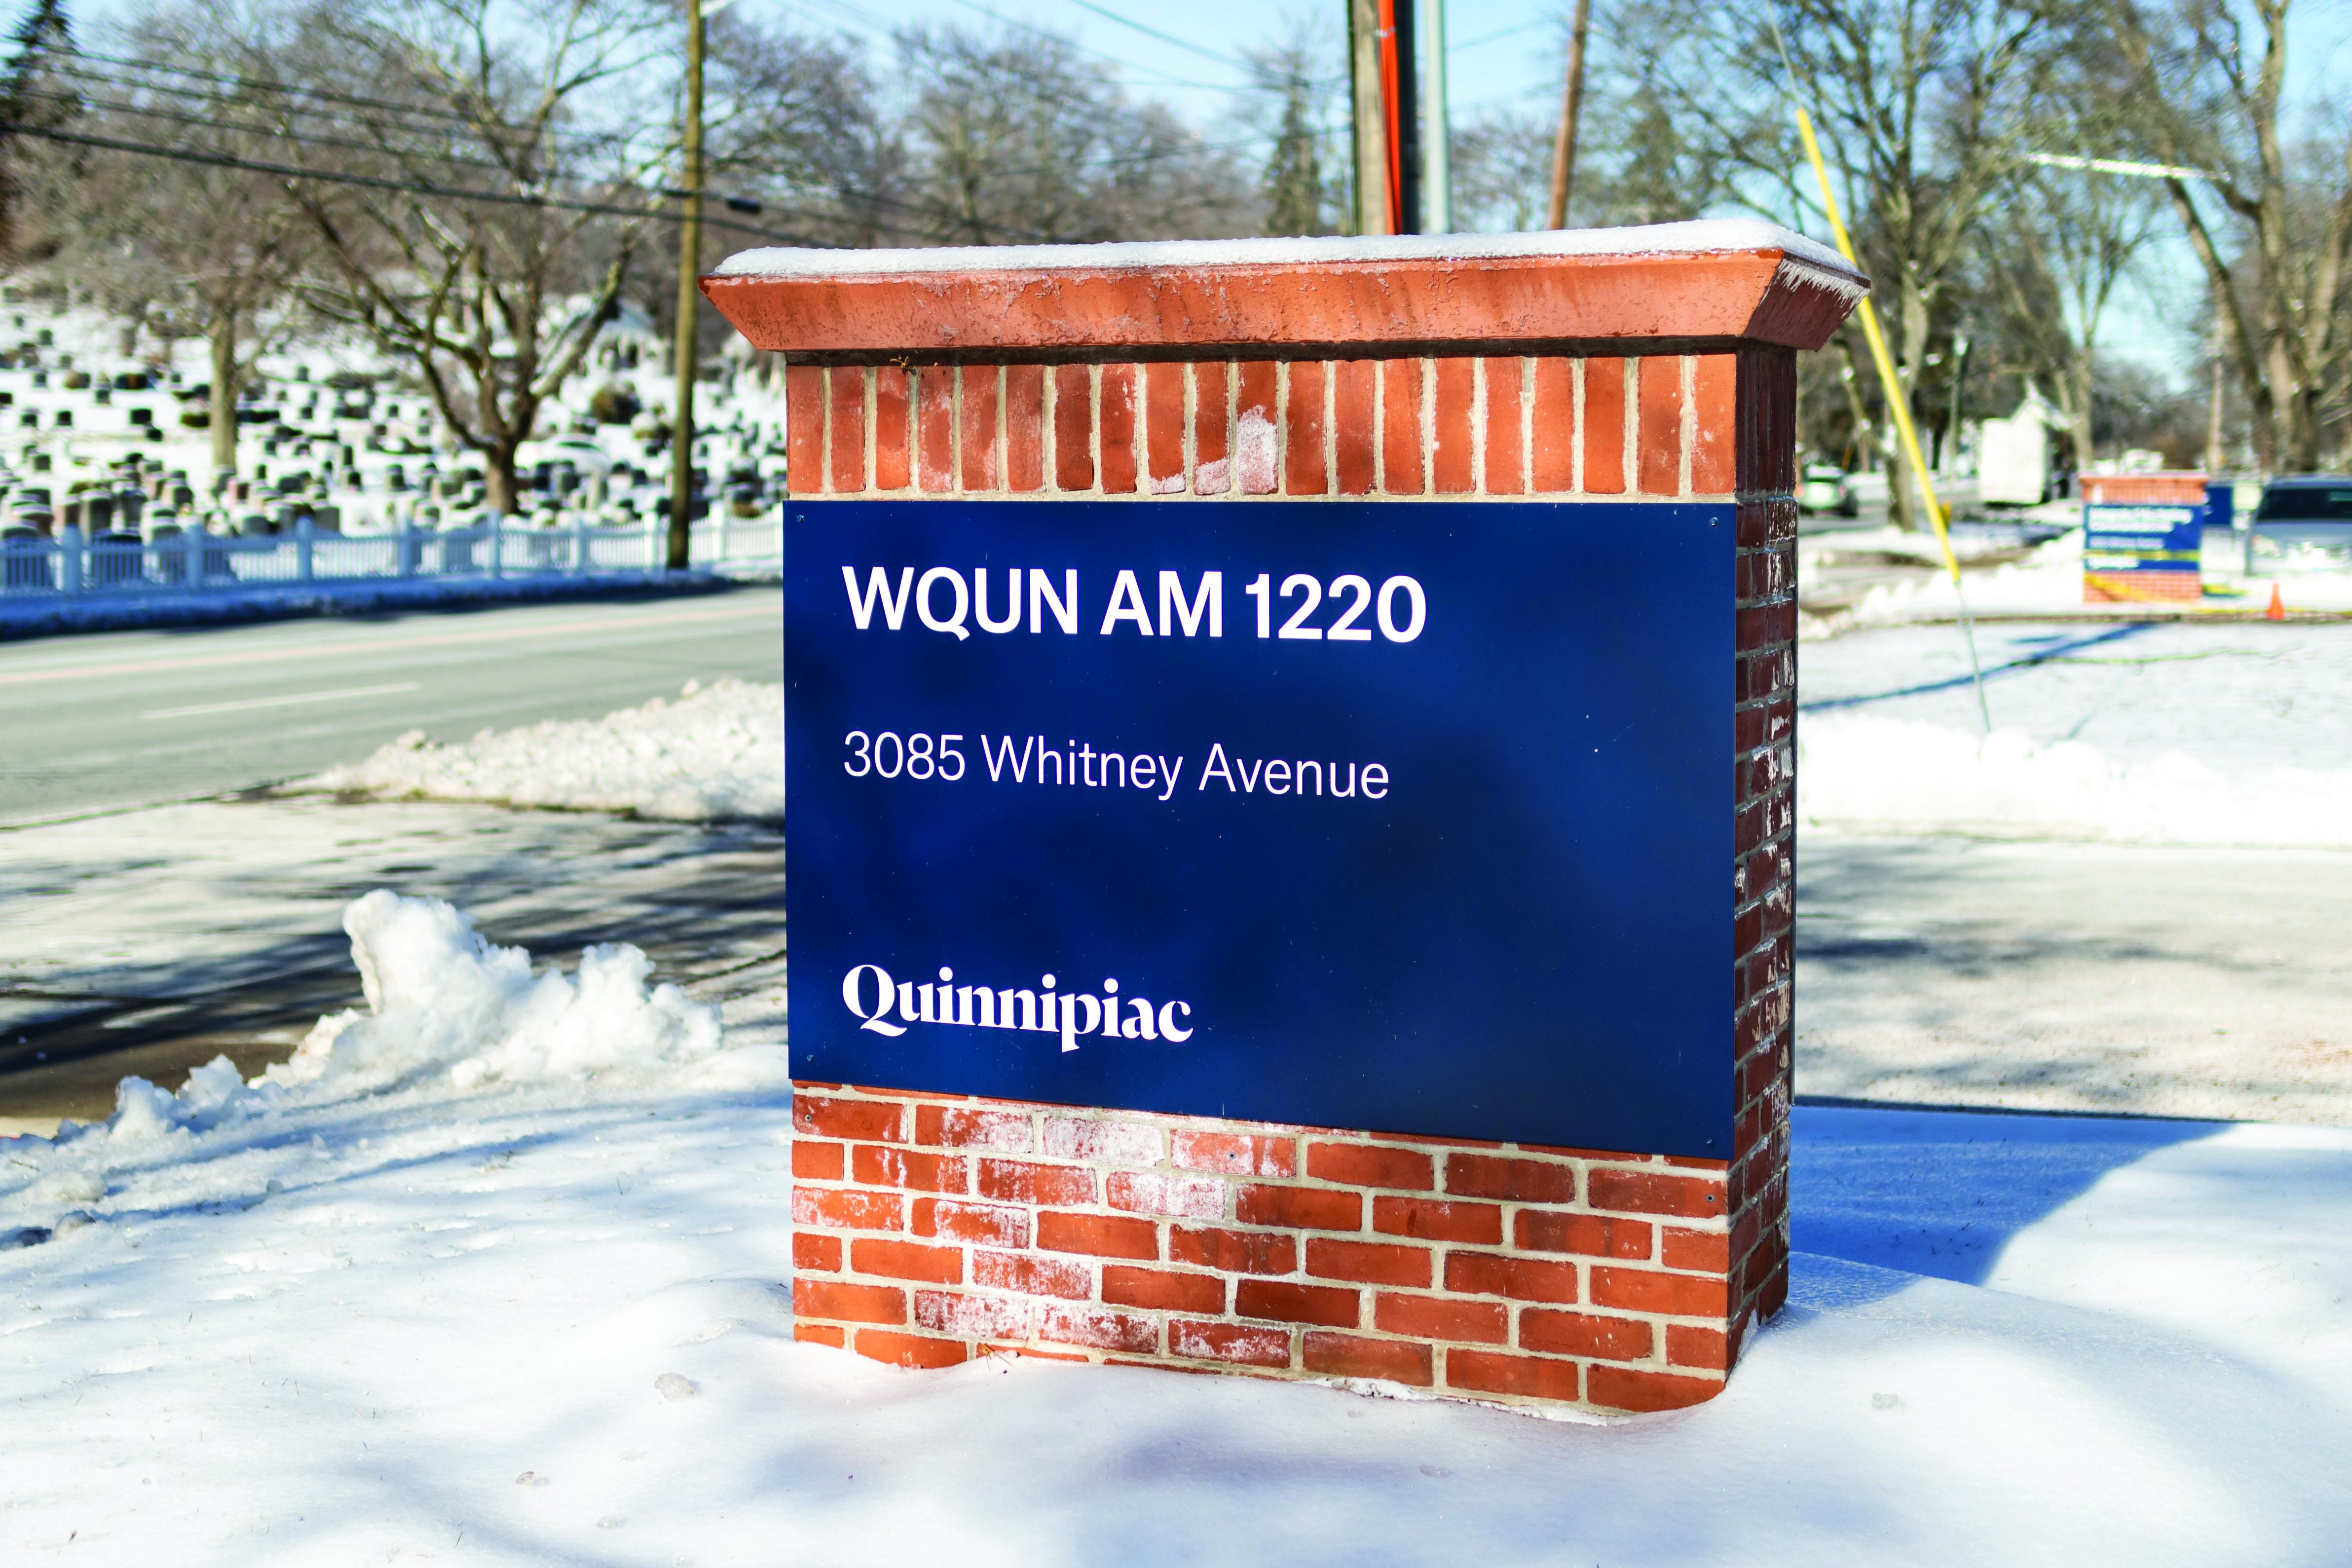 Quinnipiac radio station AM-1220 WQUN to be shut down in June